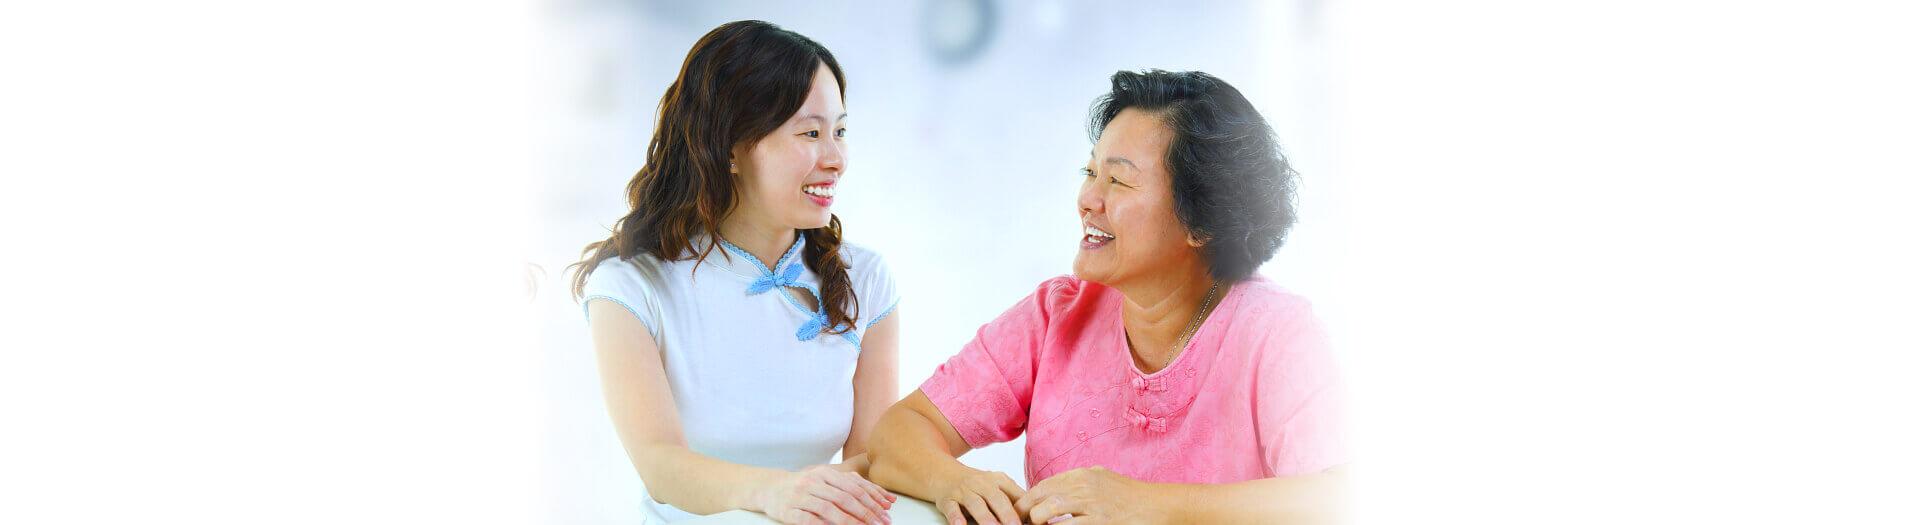 Senior with her caregiver